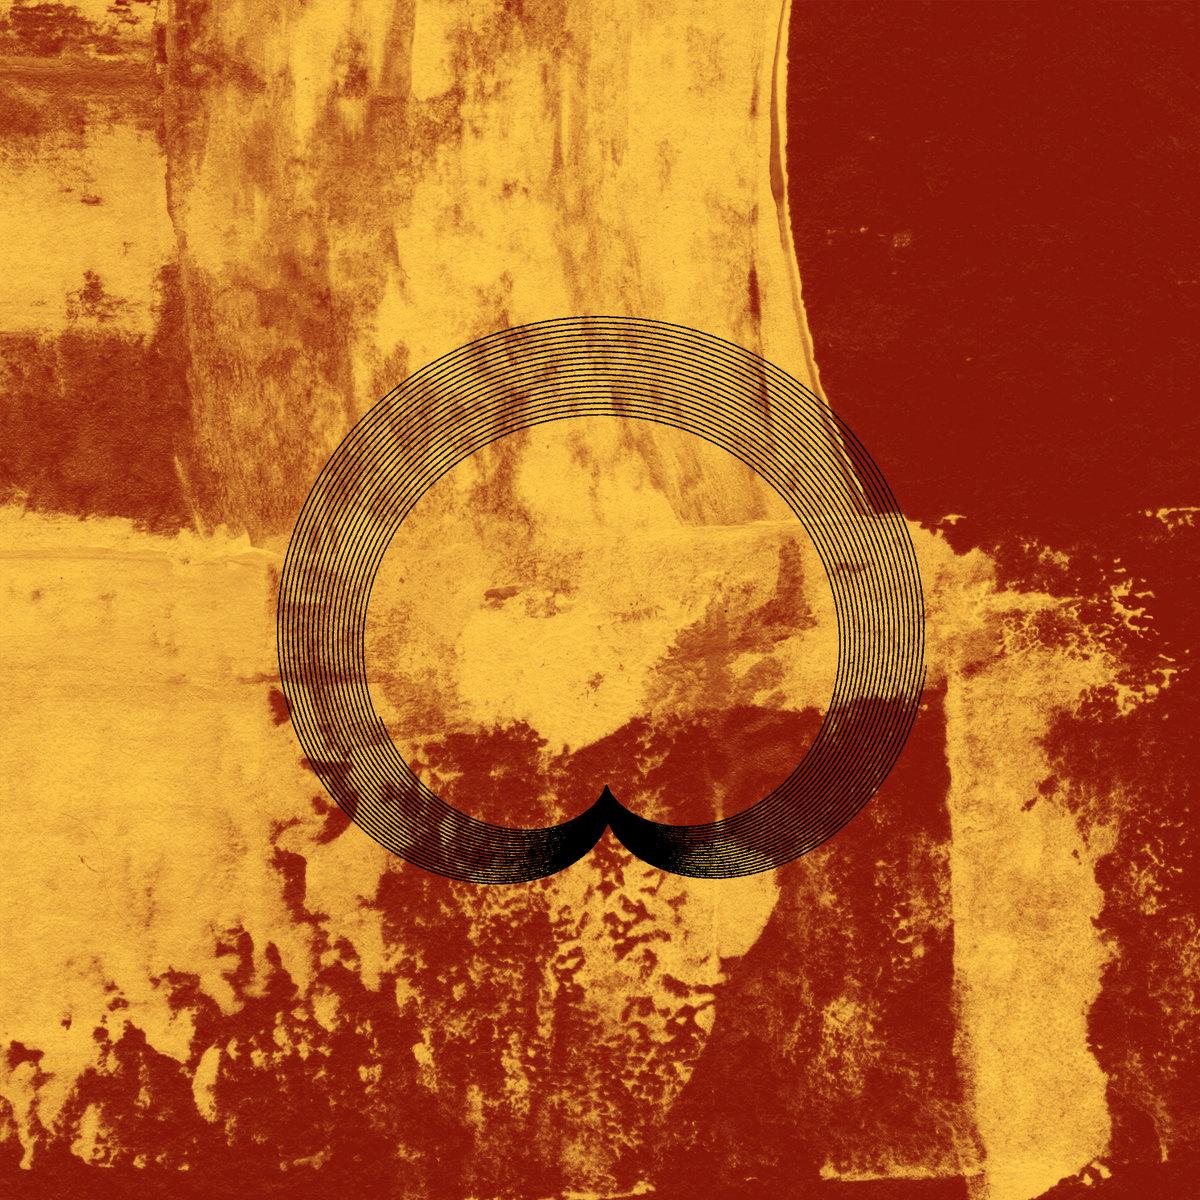 kafari knockturnes LP from Cinthesizer